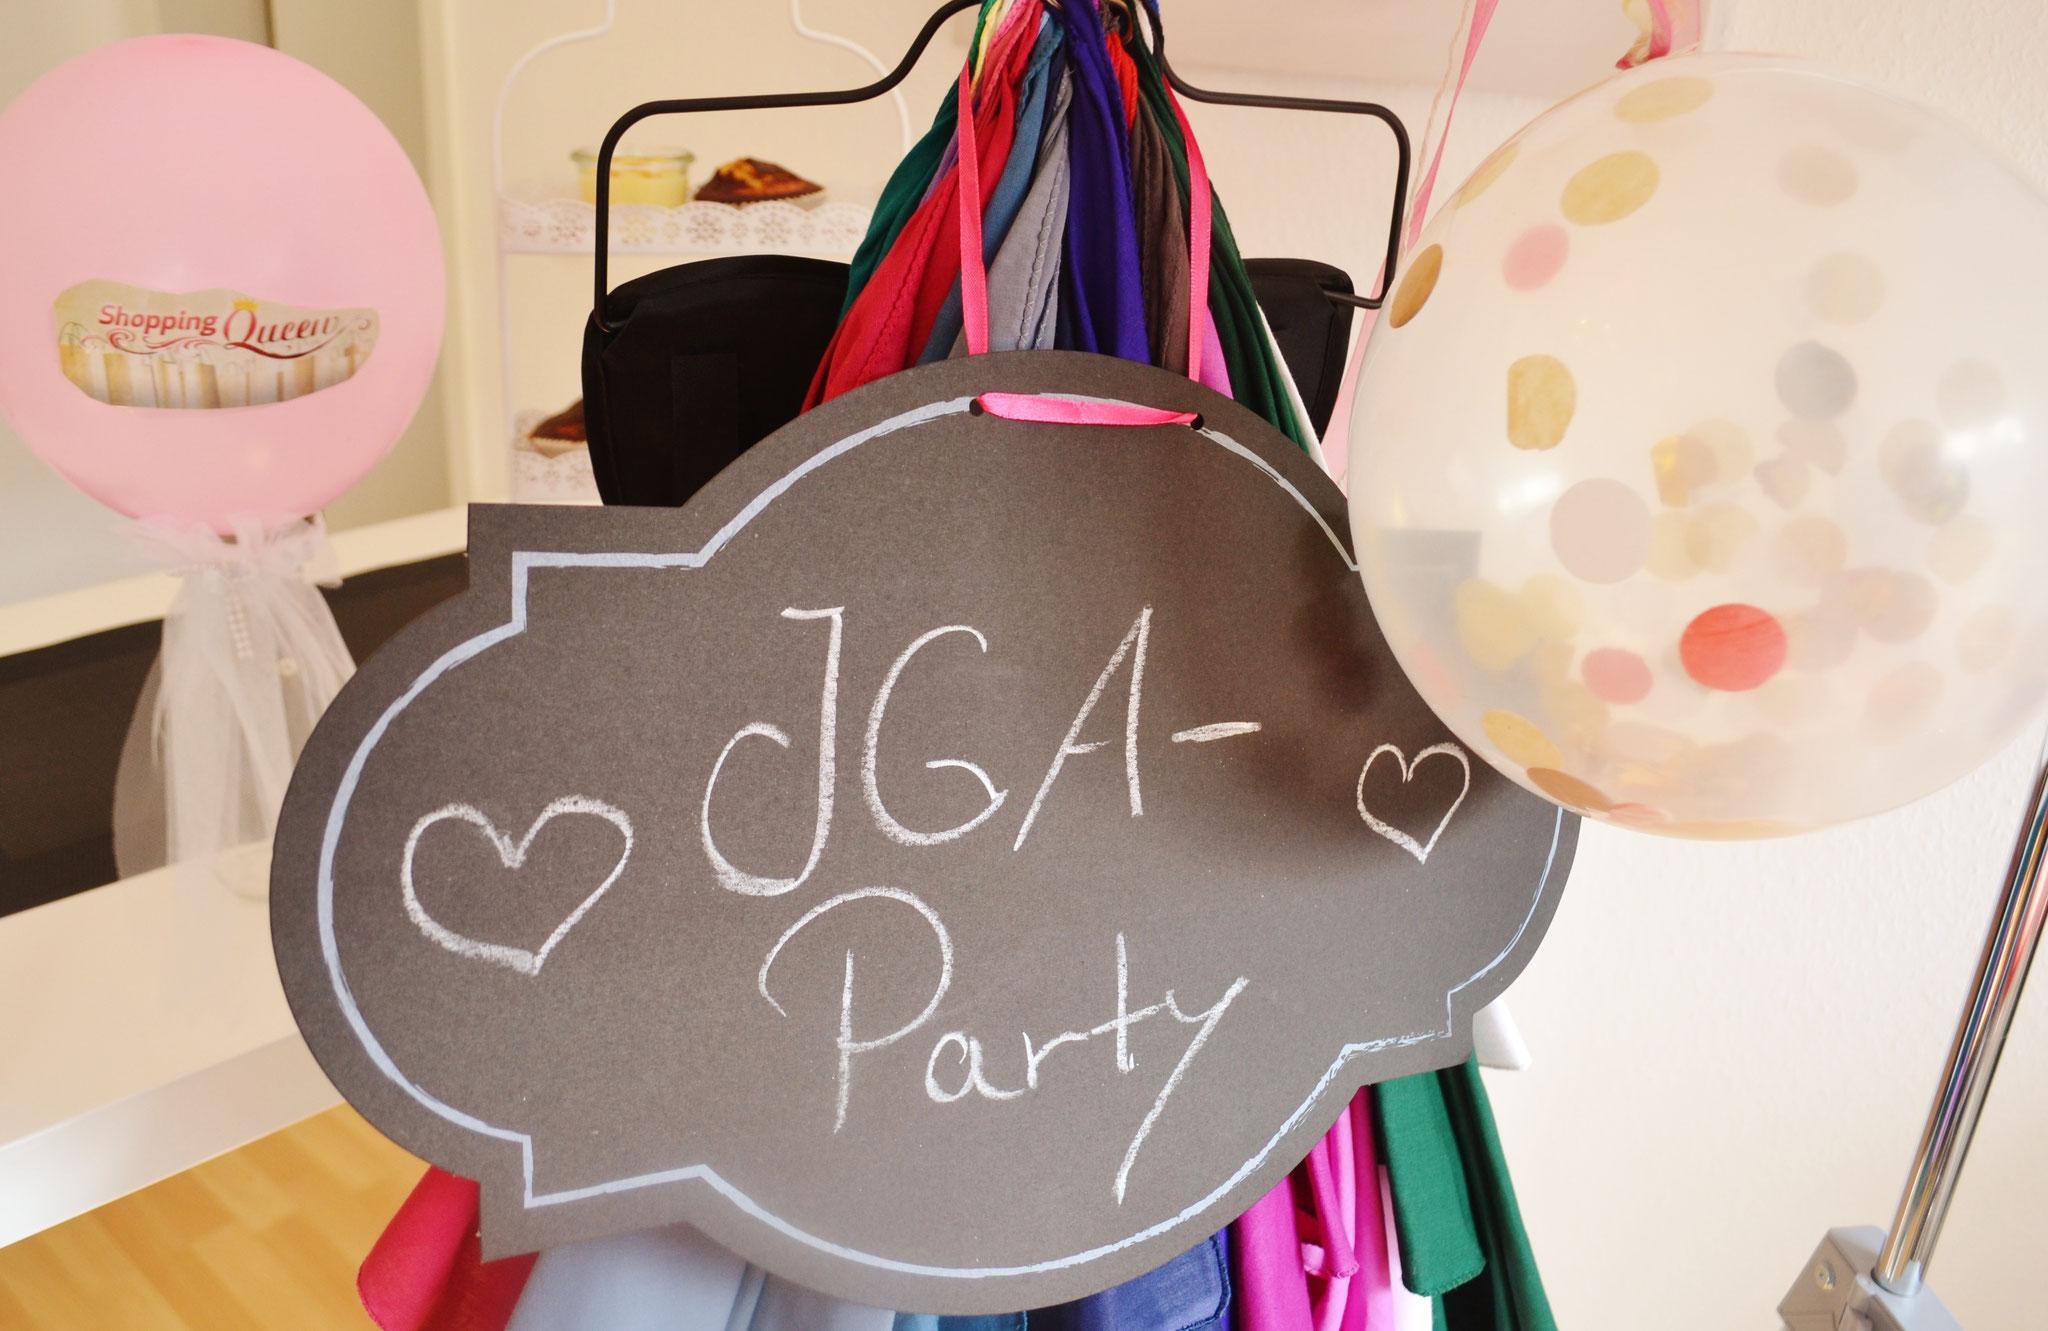 JGA-Party Styling-Event Mainz, Koblenz, Alzey, Kibo, RLP, Hessen